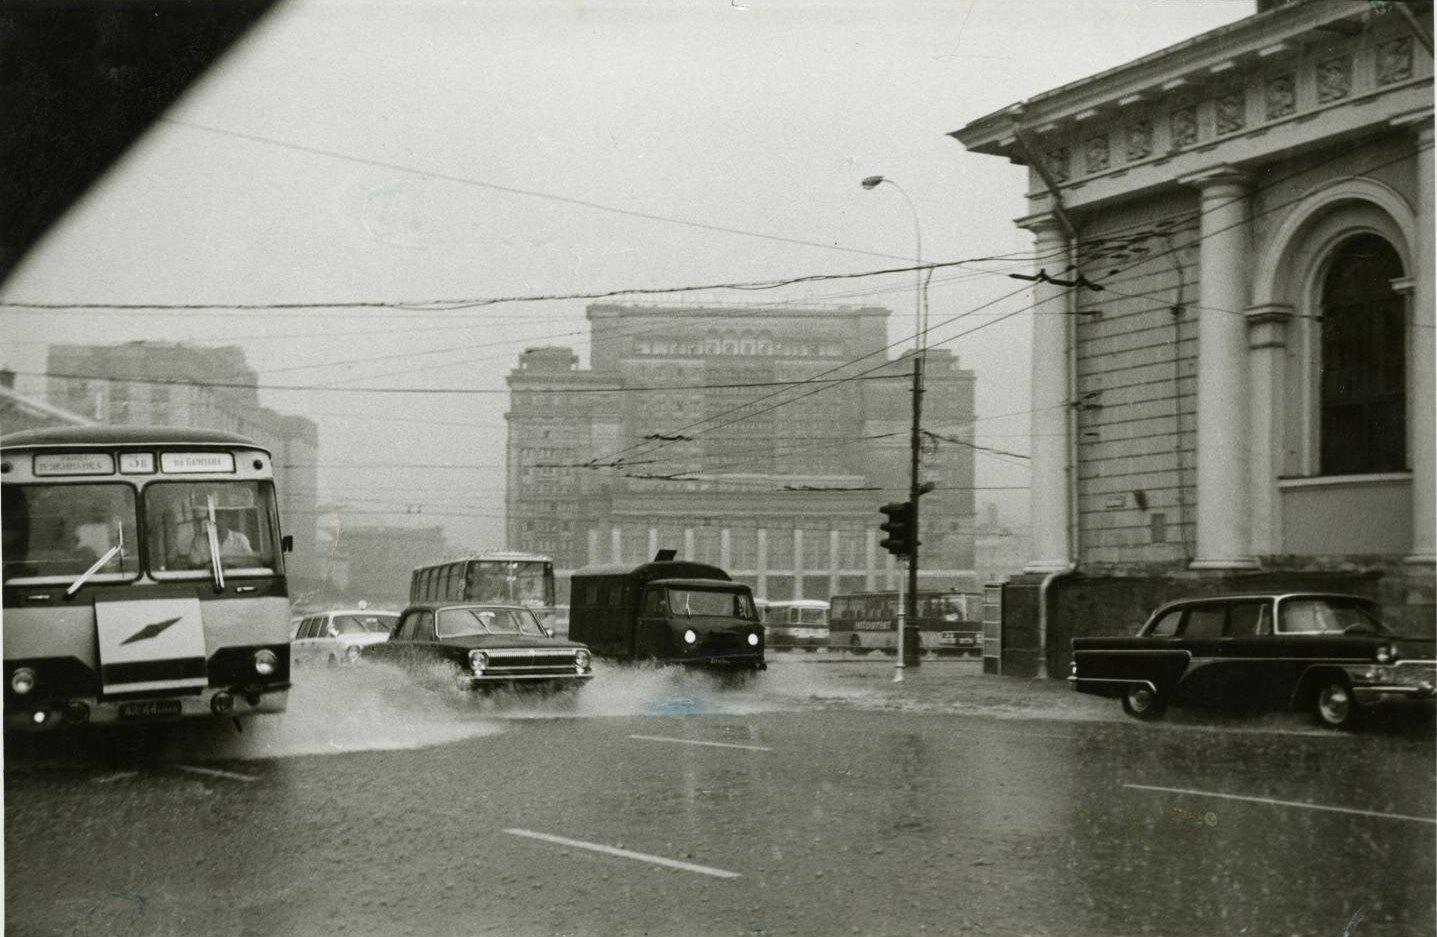 1970-е. Вид на гостиницу «Москва» и движущийся перед ней транспорт во время сильного дождя (5)